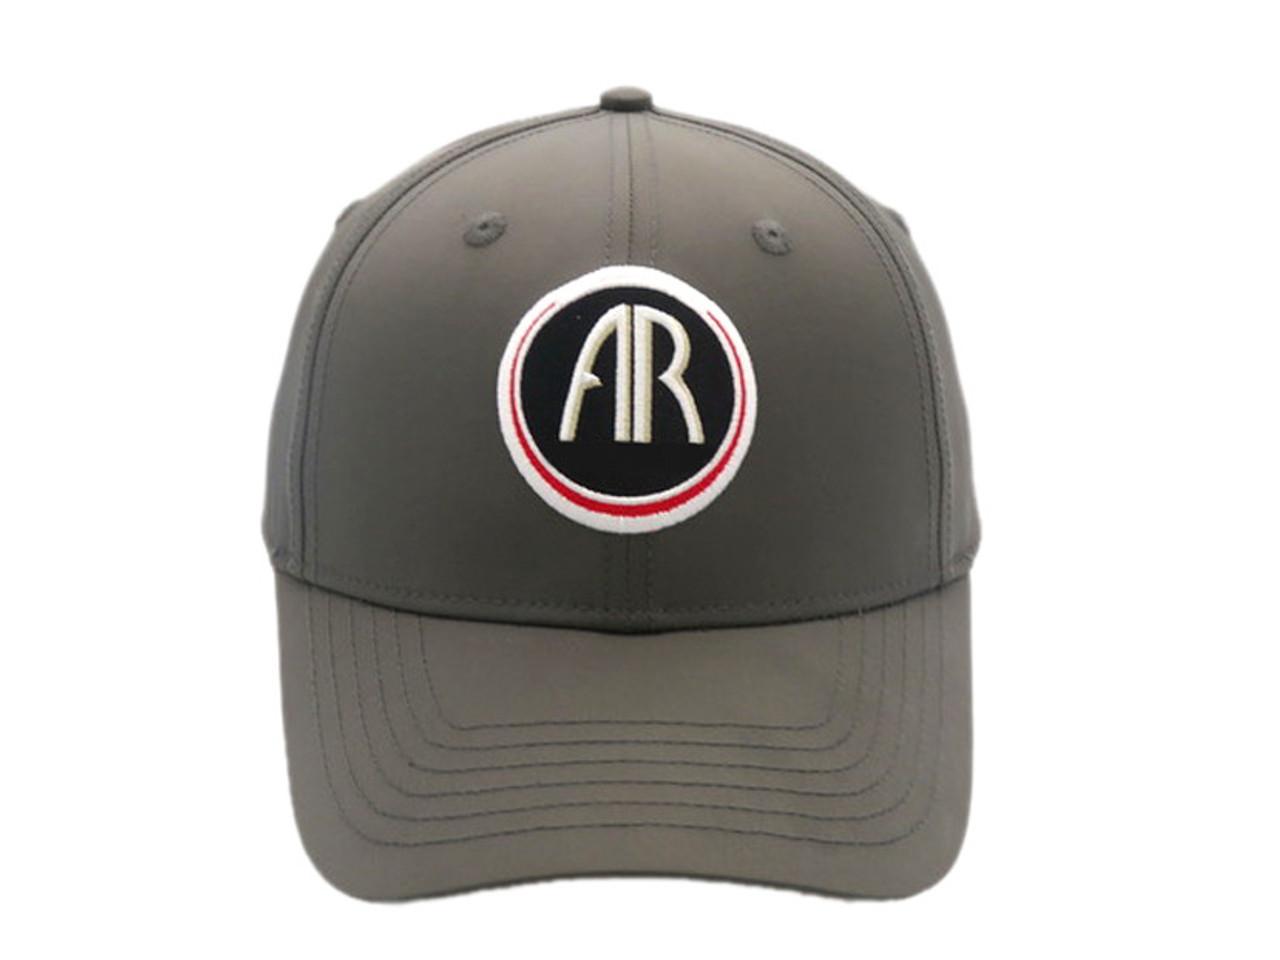 Grey Auto Ricambi hat